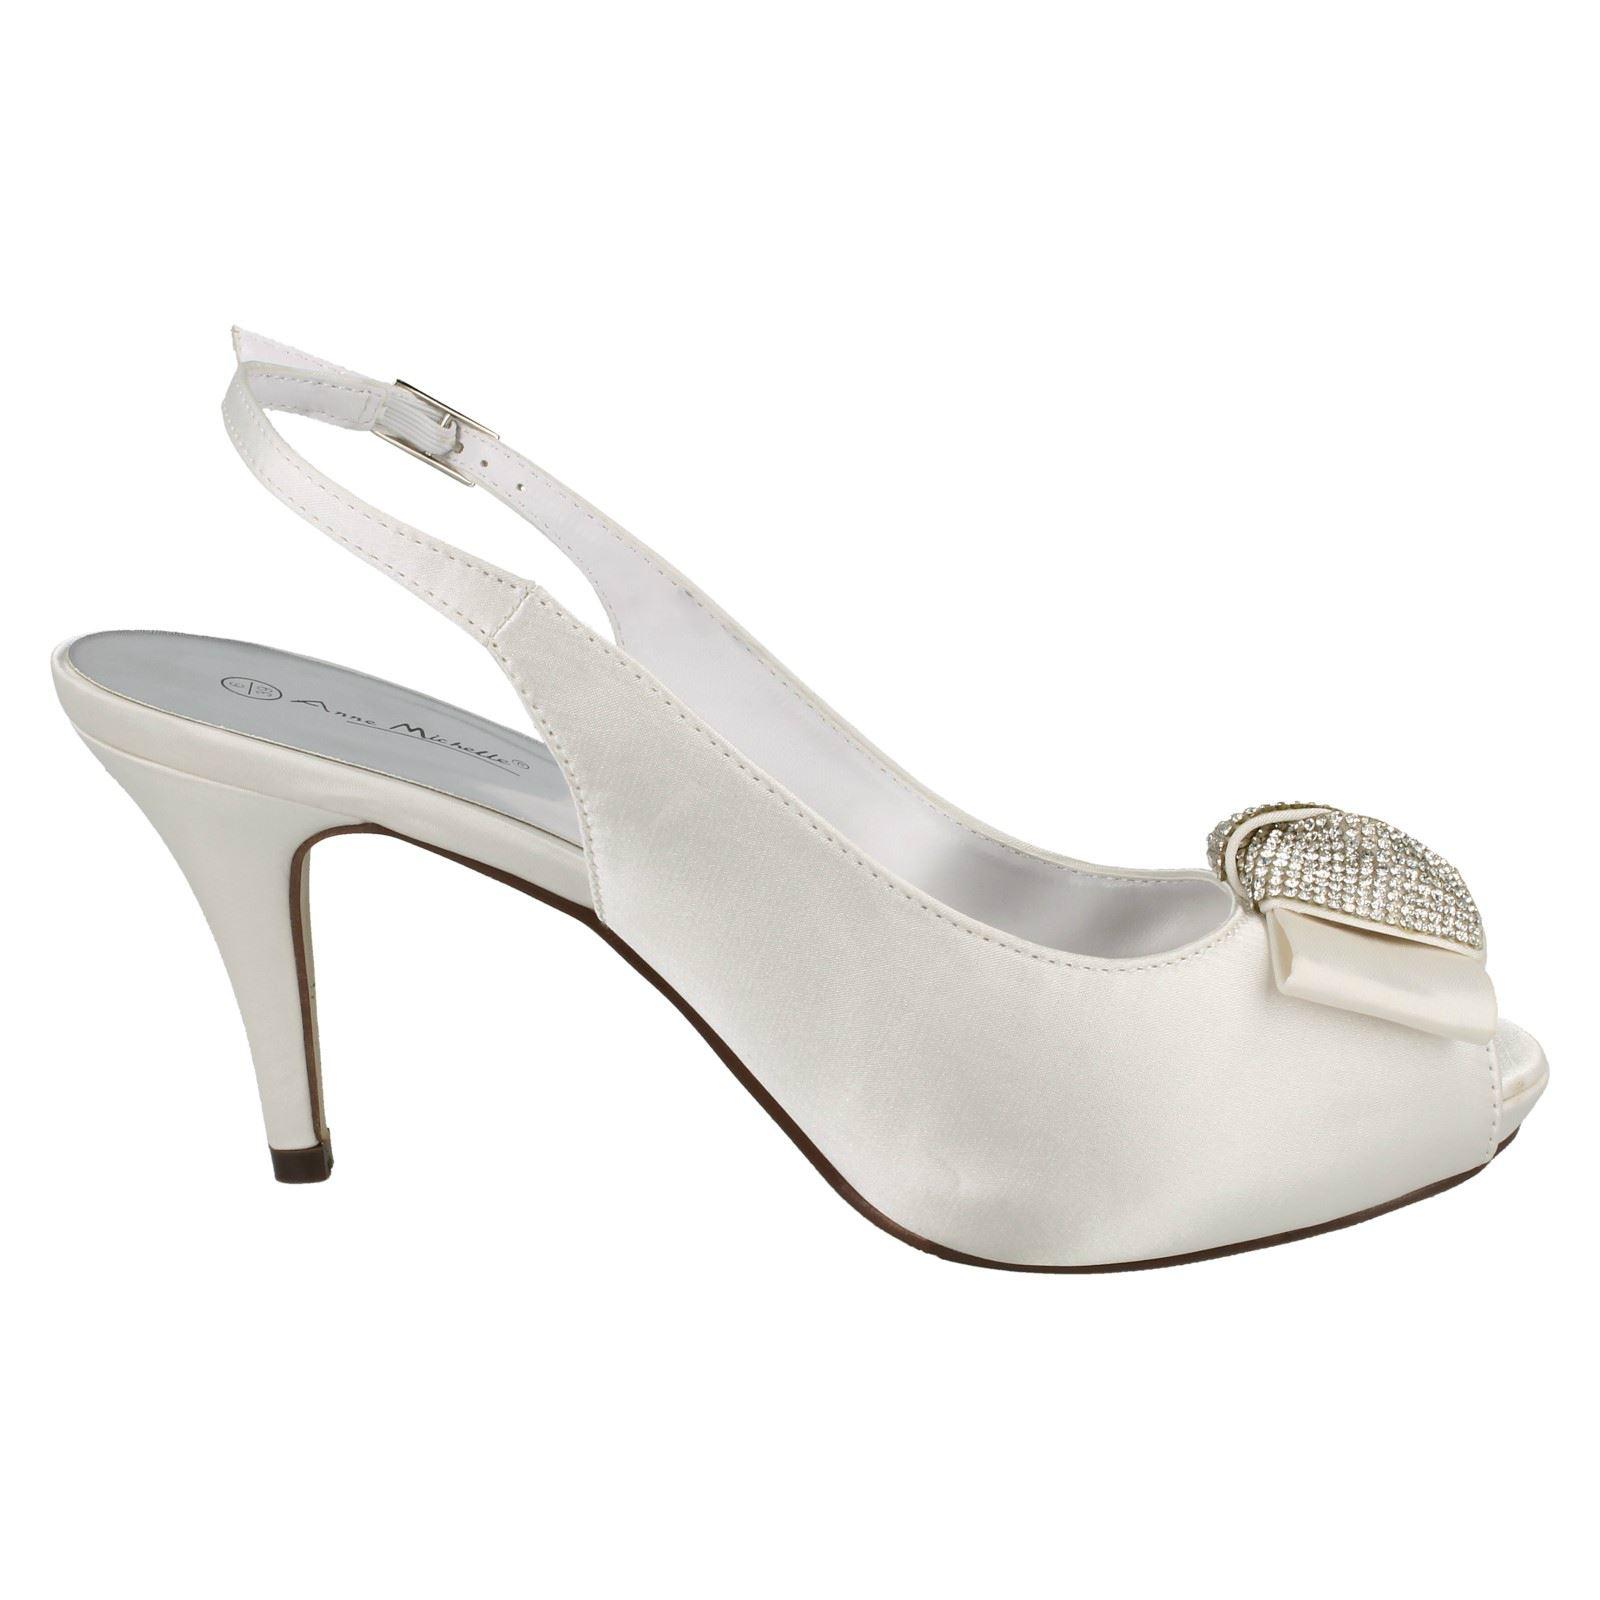 Damas Anne Michelle Punta Abierta Tribunal Zapatos Estilo 254